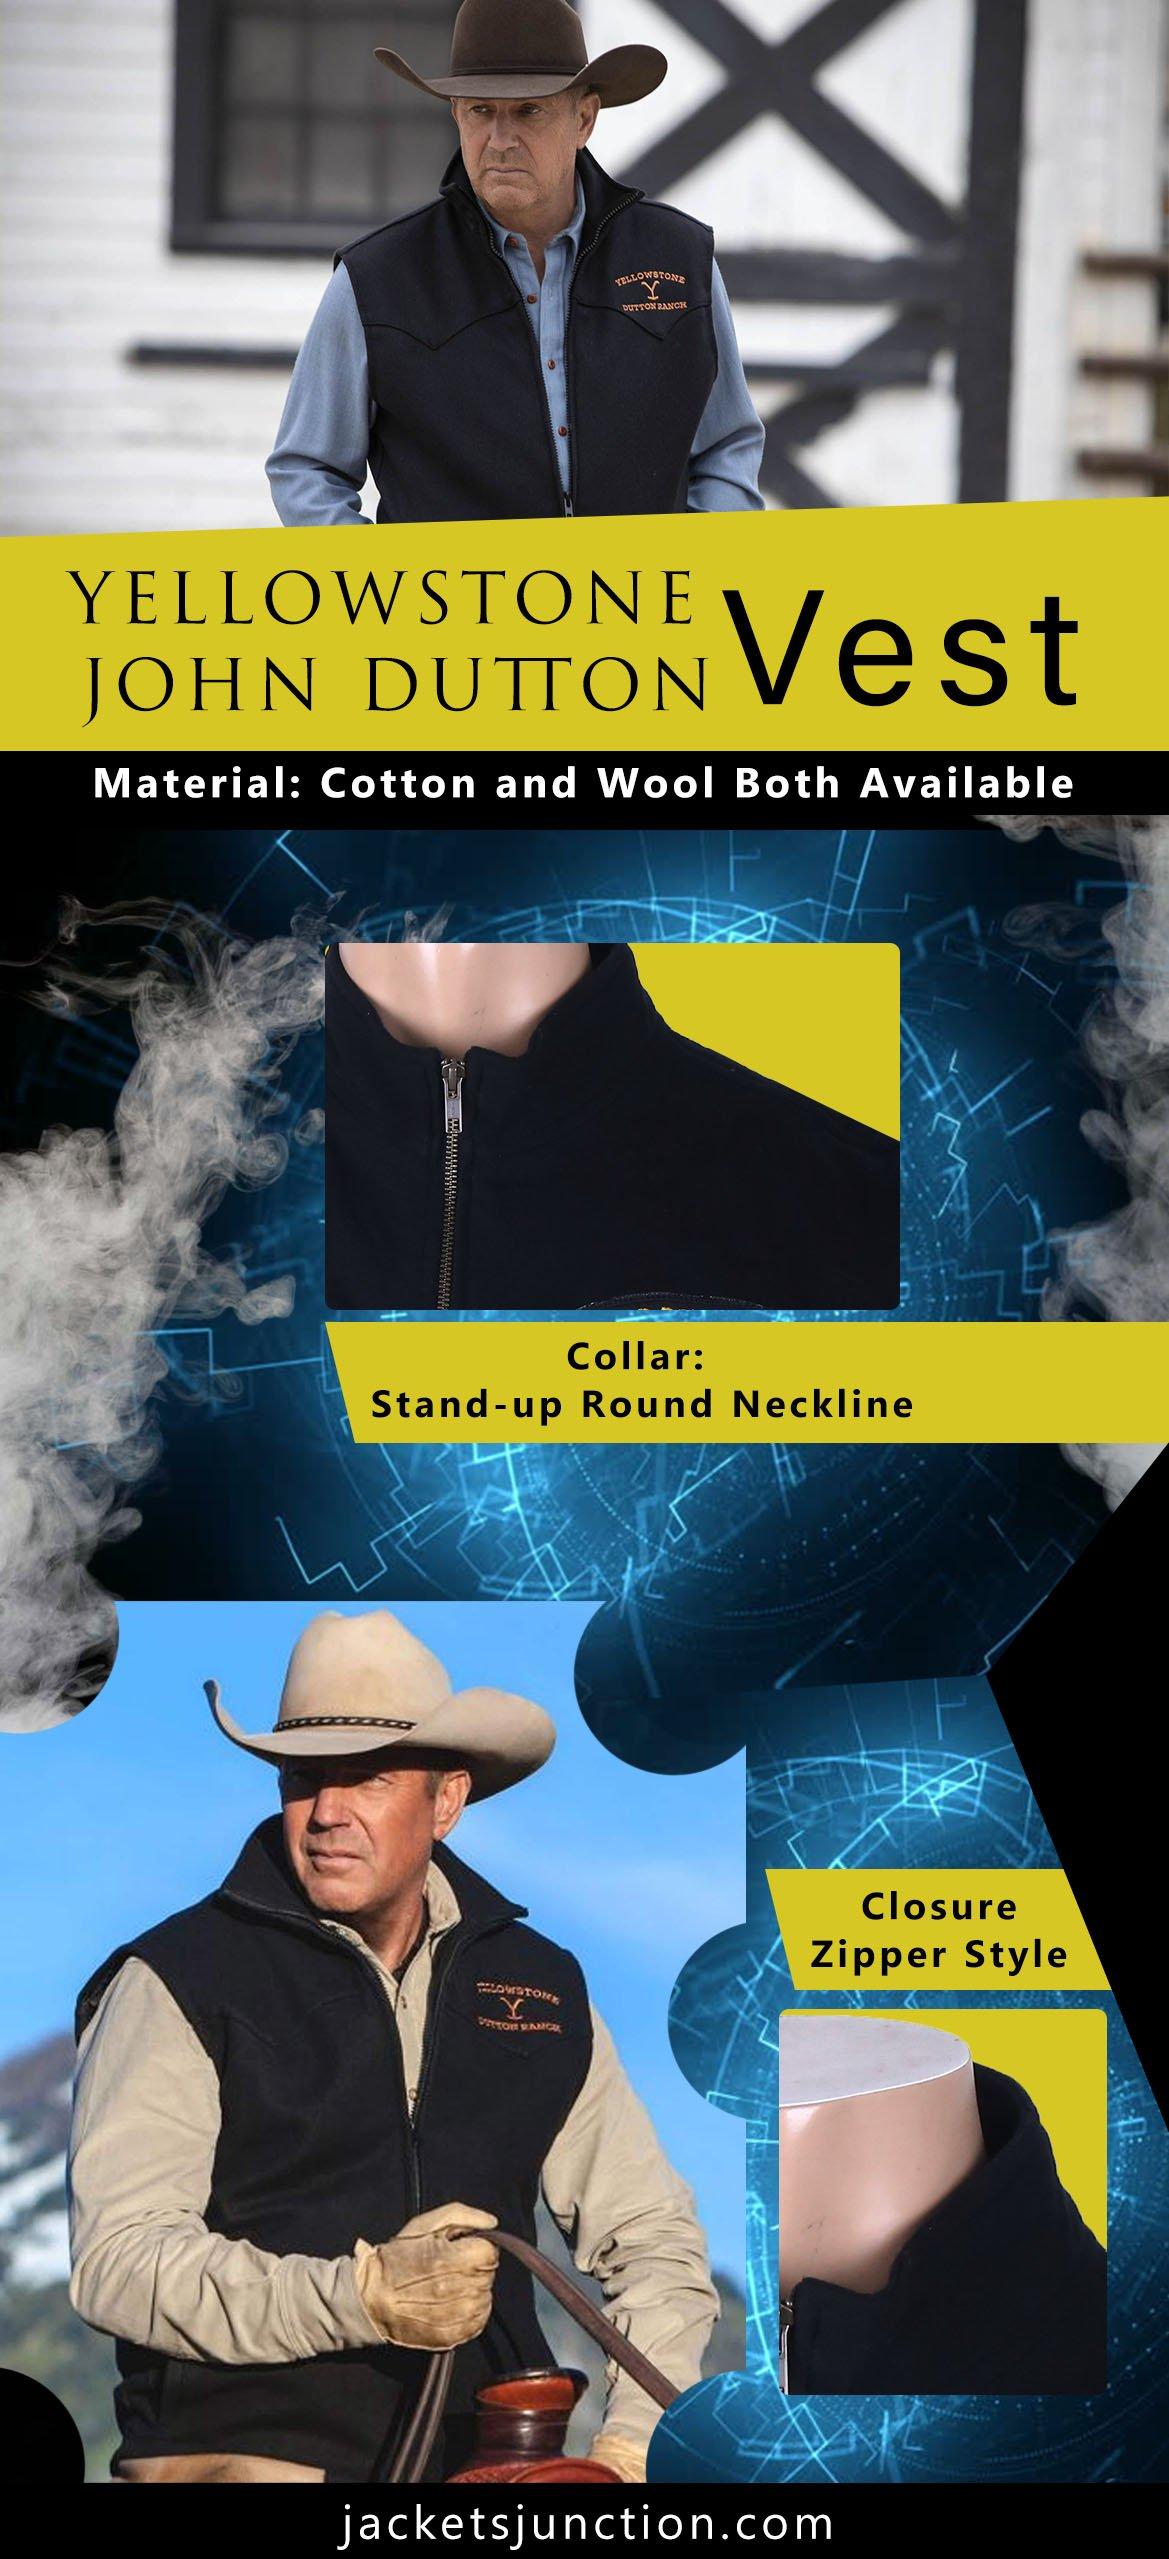 Yellowstone John Dutton Vest Wool Blend infographic banner